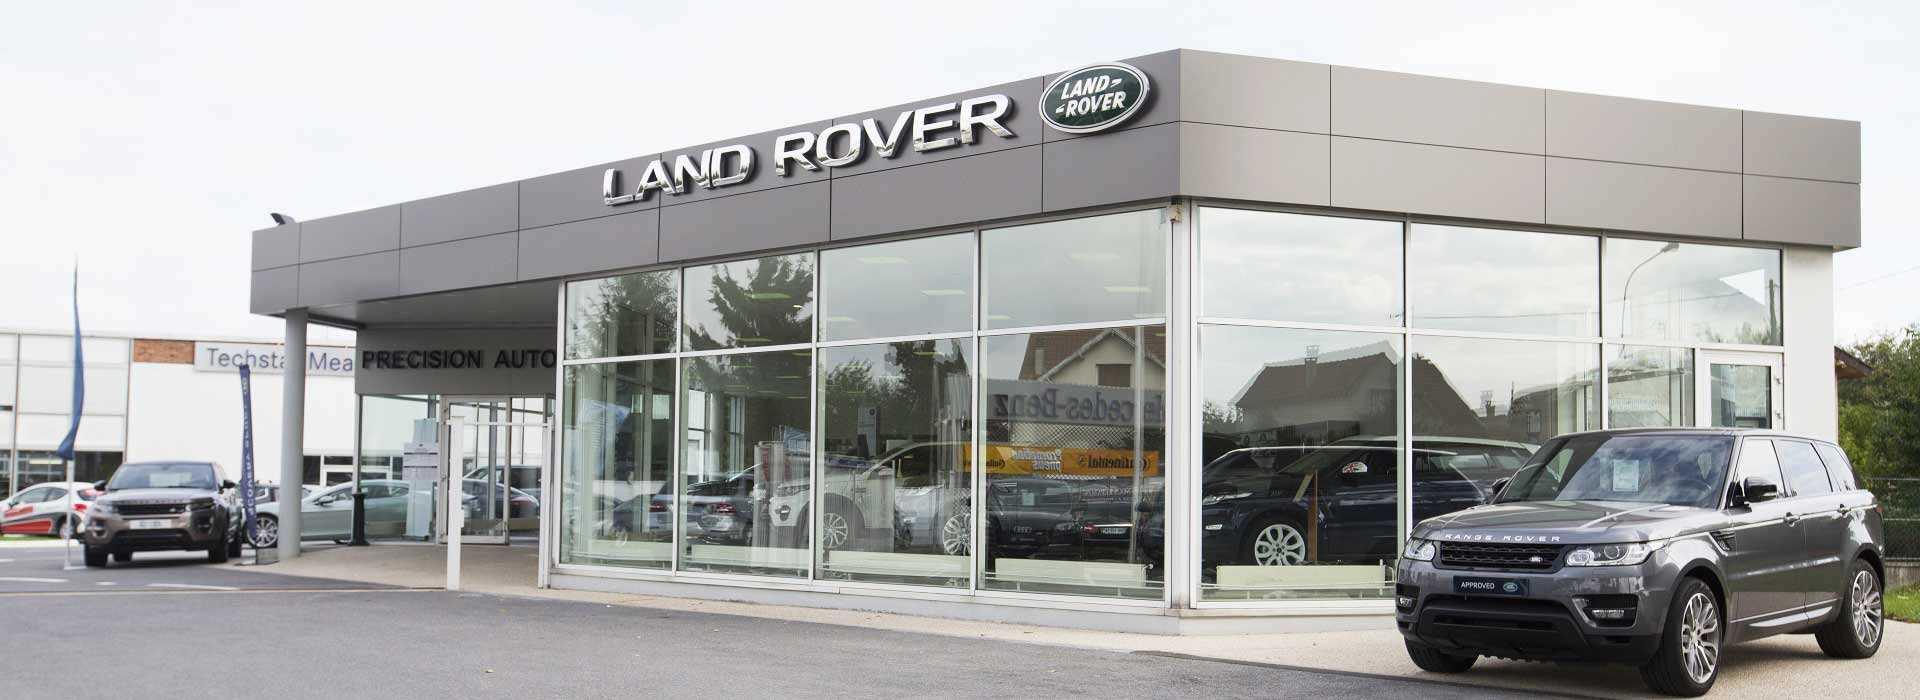 land rover meaux concessionnaire garage seine et marne 77. Black Bedroom Furniture Sets. Home Design Ideas